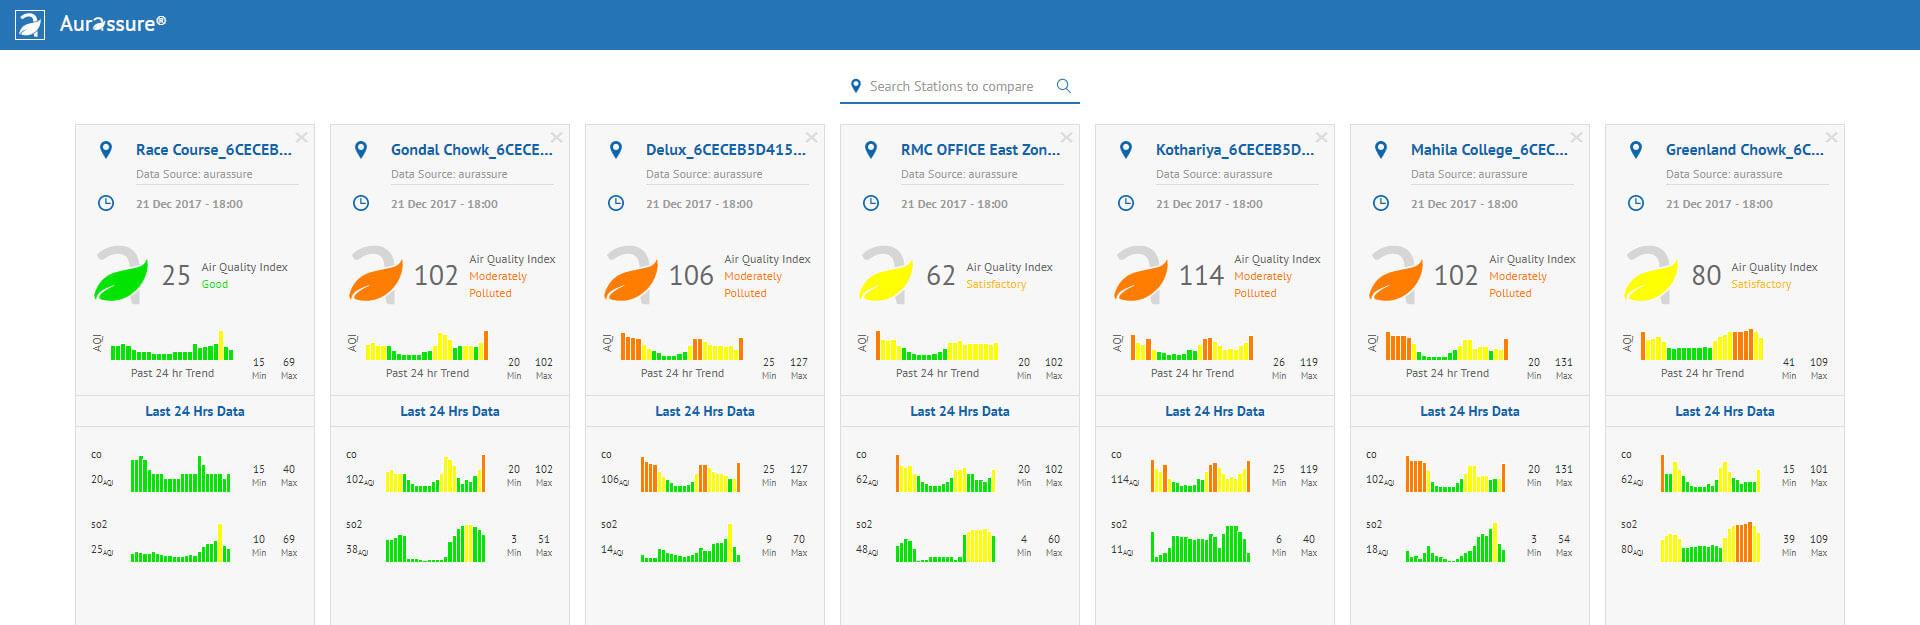 Rajkot-Smart-City Stations